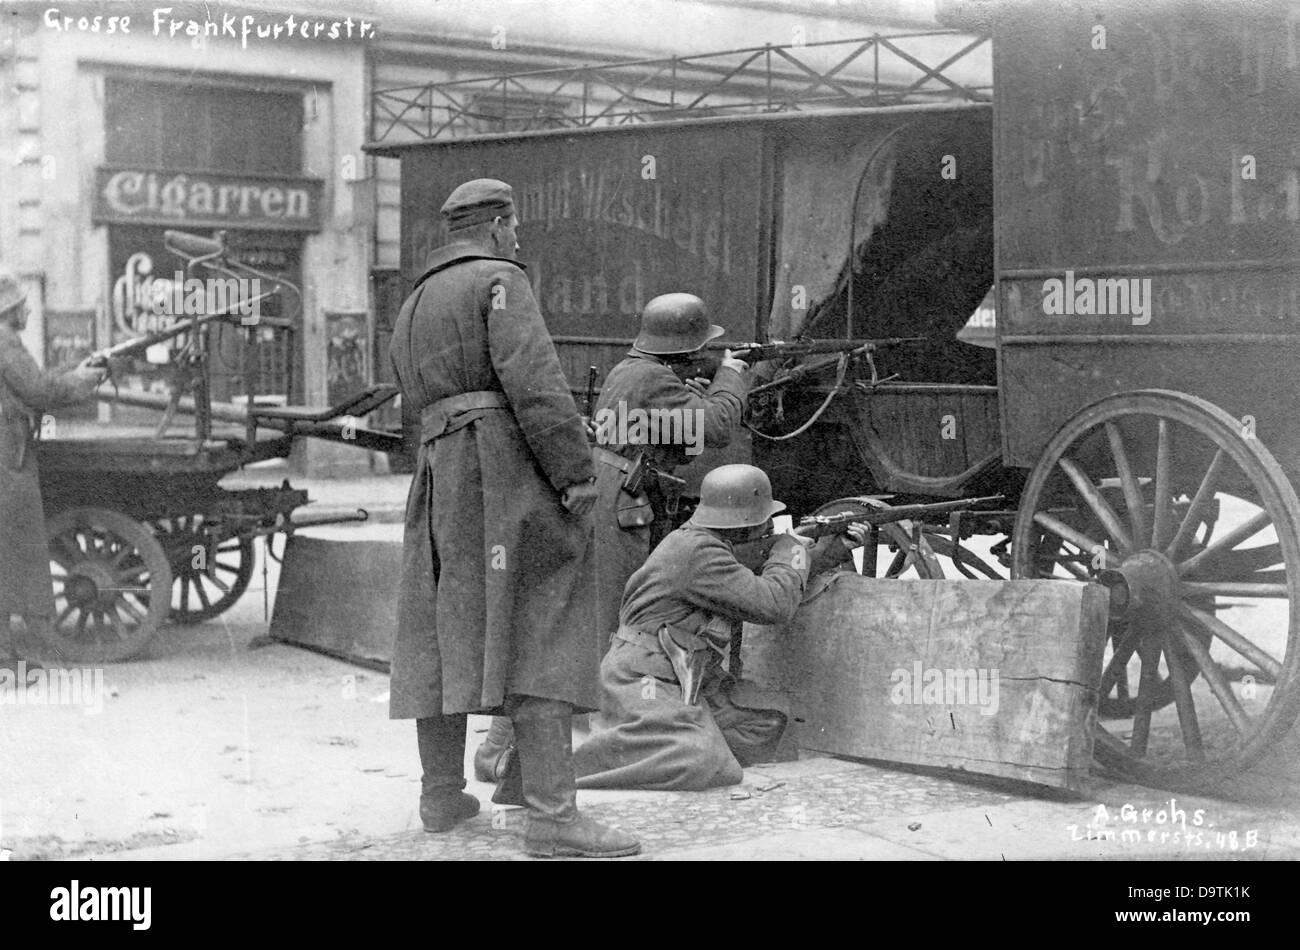 German Revolution 1918/1919: Scene of the street fights at a barricade in Grosse Frankfurter Strasse in Berlin, - Stock Image